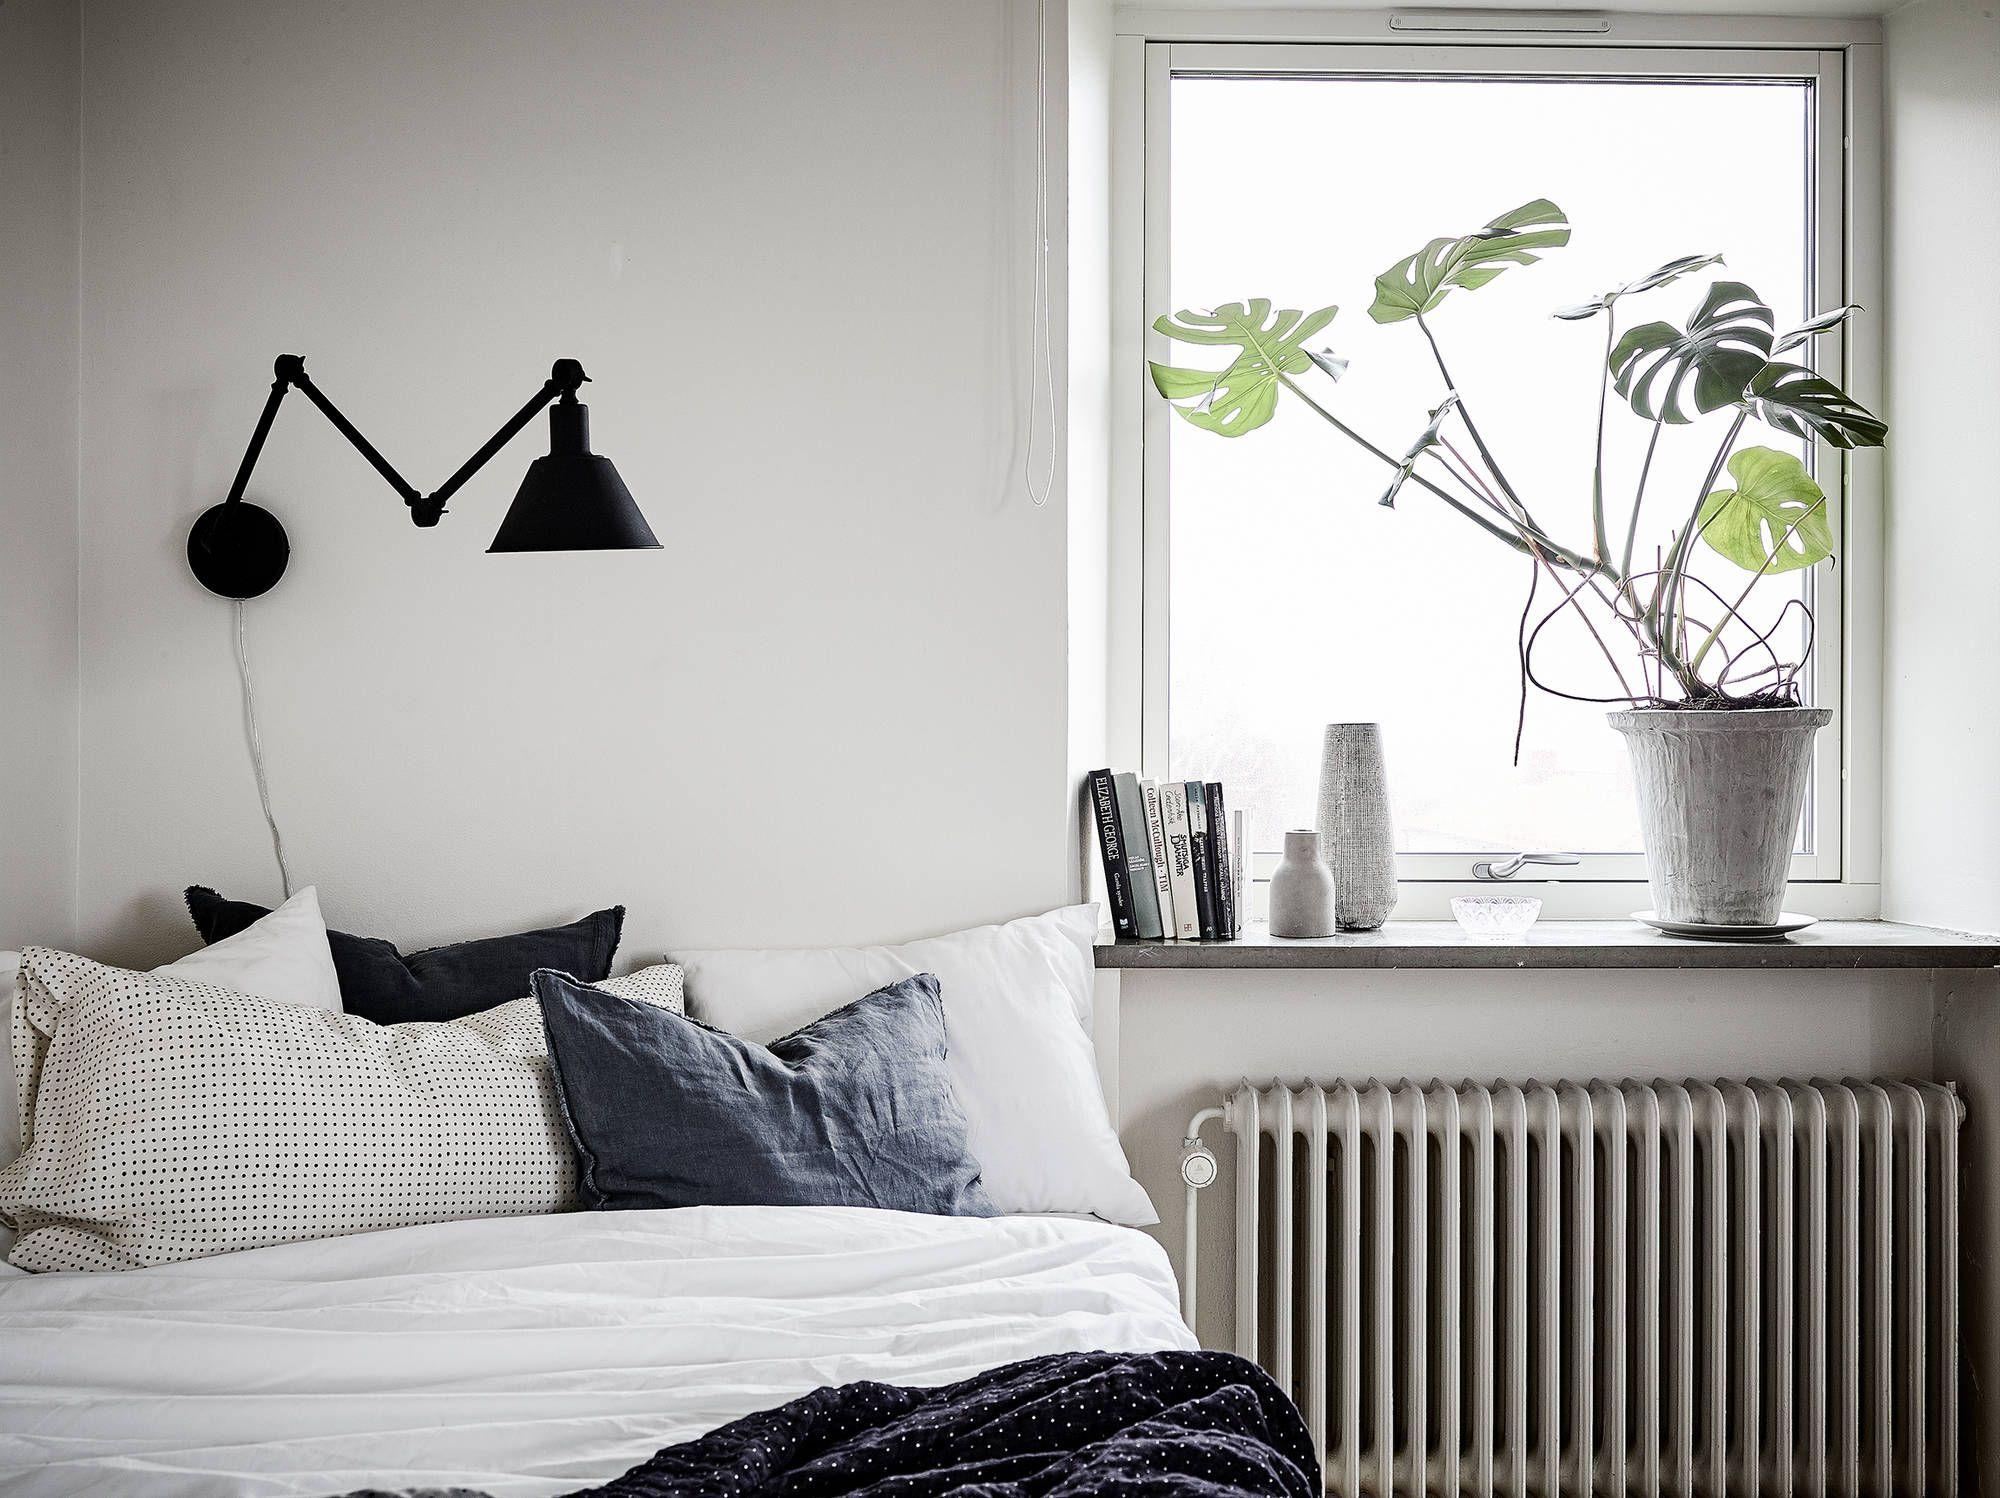 Home park design bilder raketgatan   stadshem  home interior  pinterest  interiors